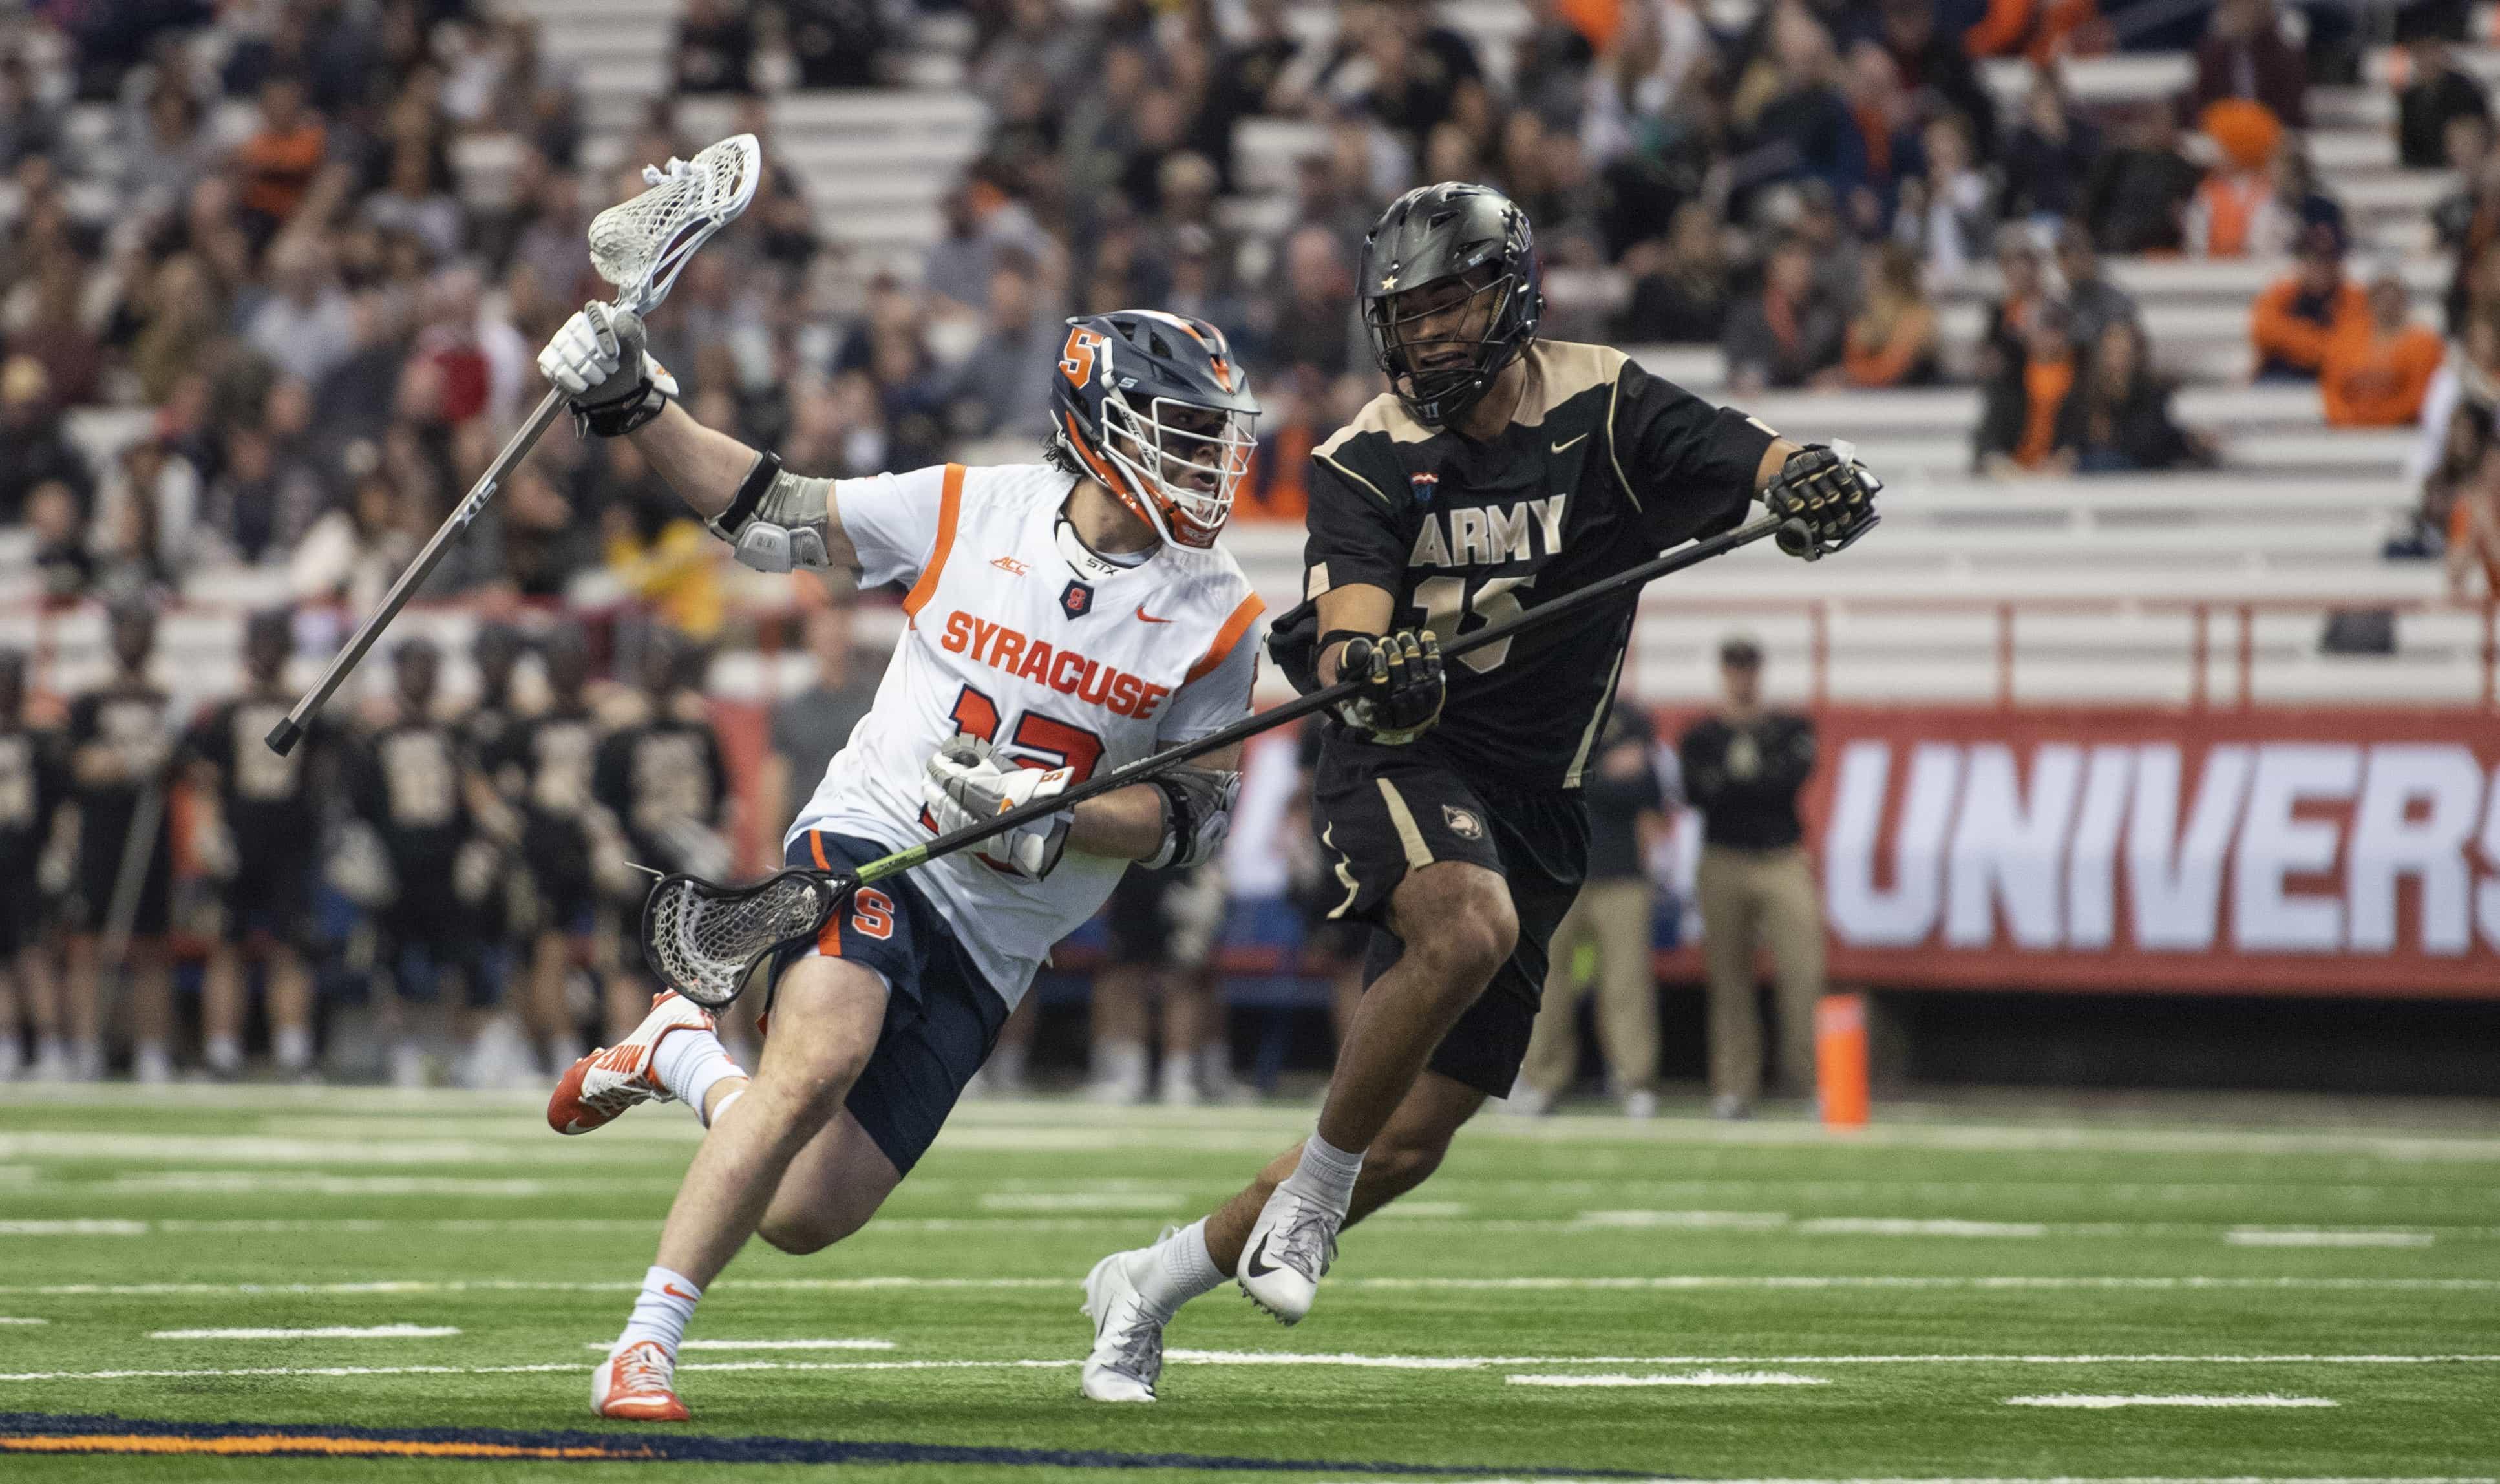 Freshman Pete Fiorini runs around an Army defender.